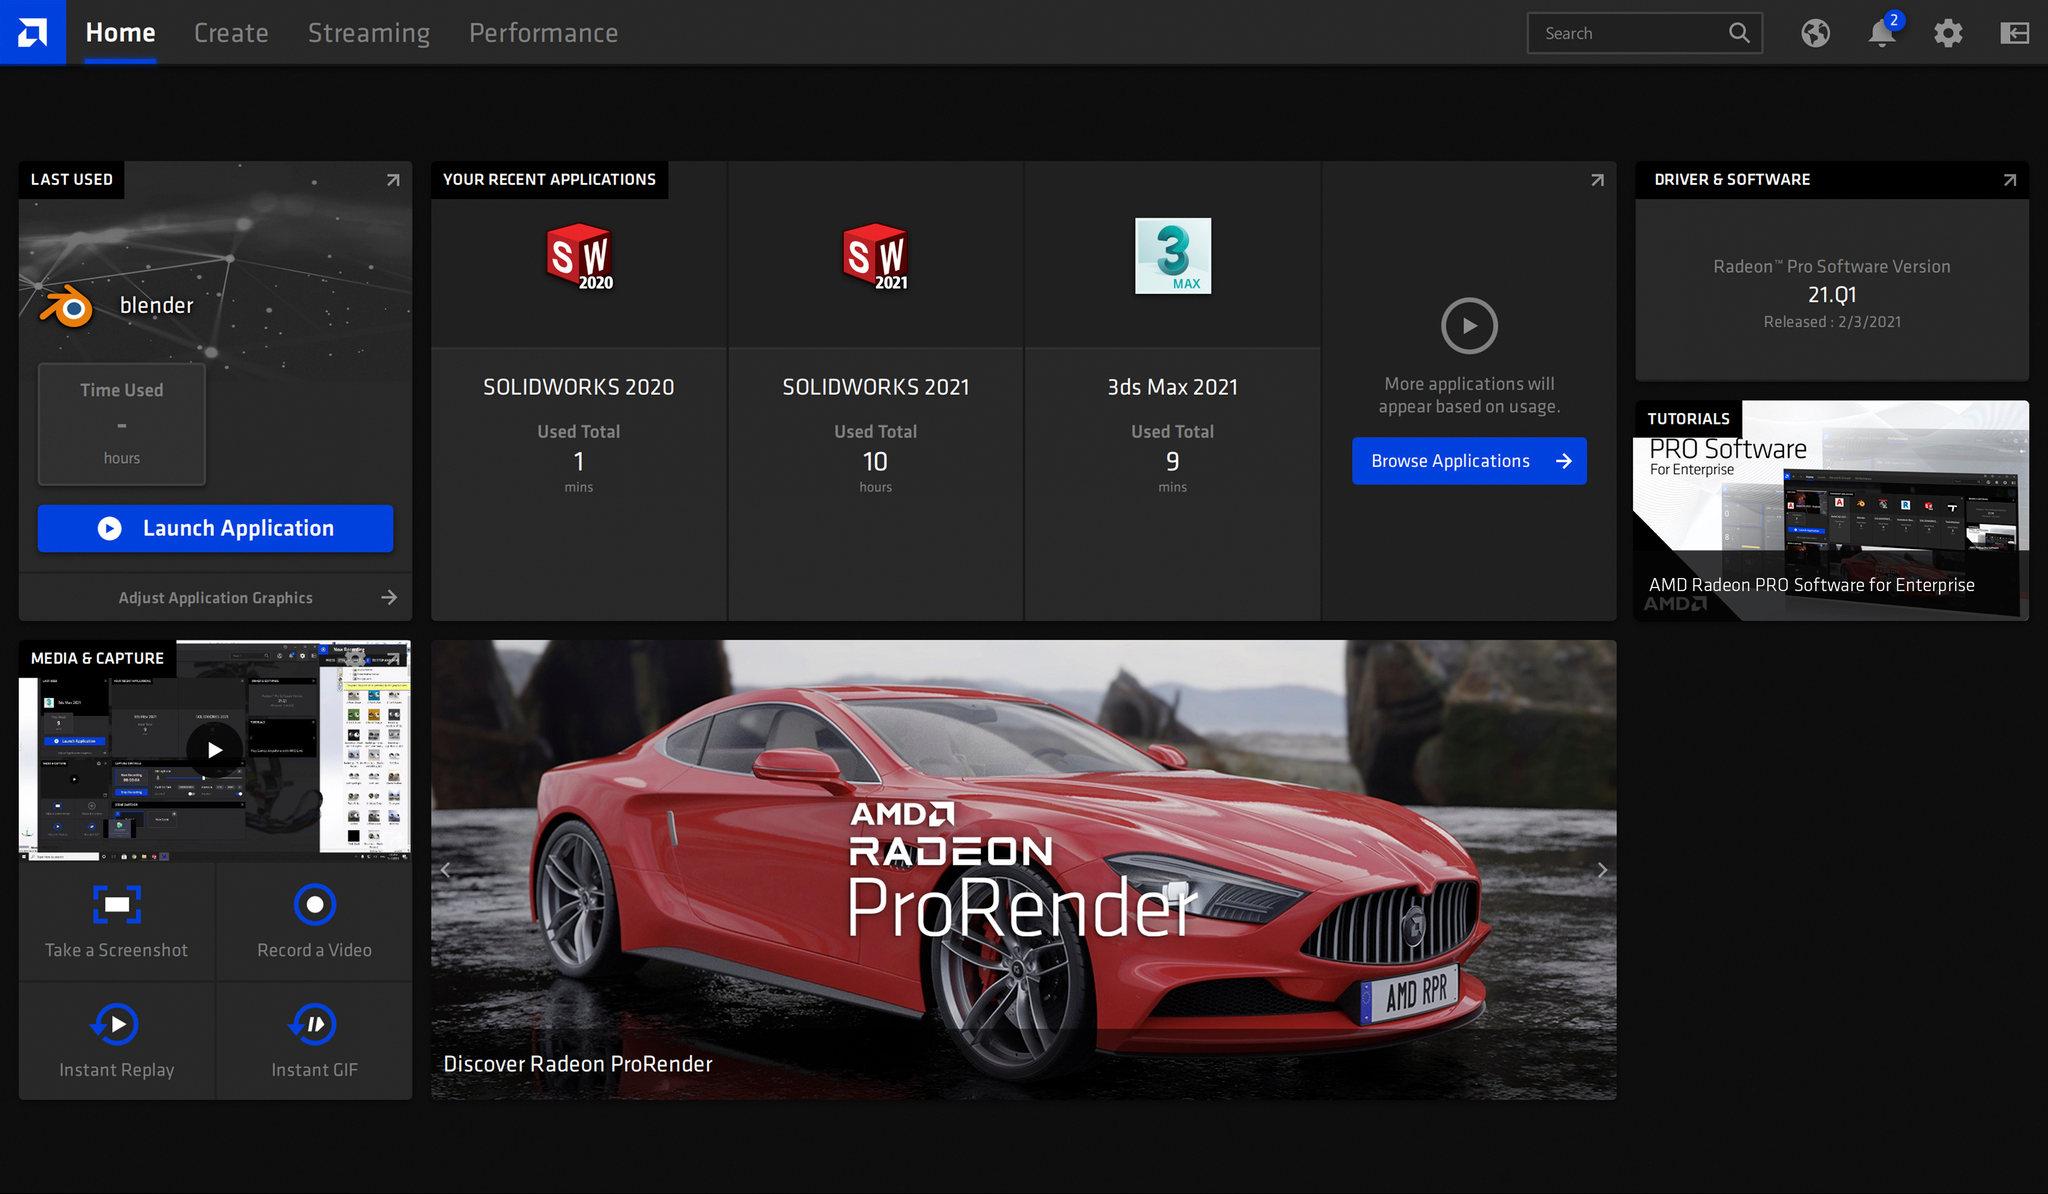 Radeon PRO Software